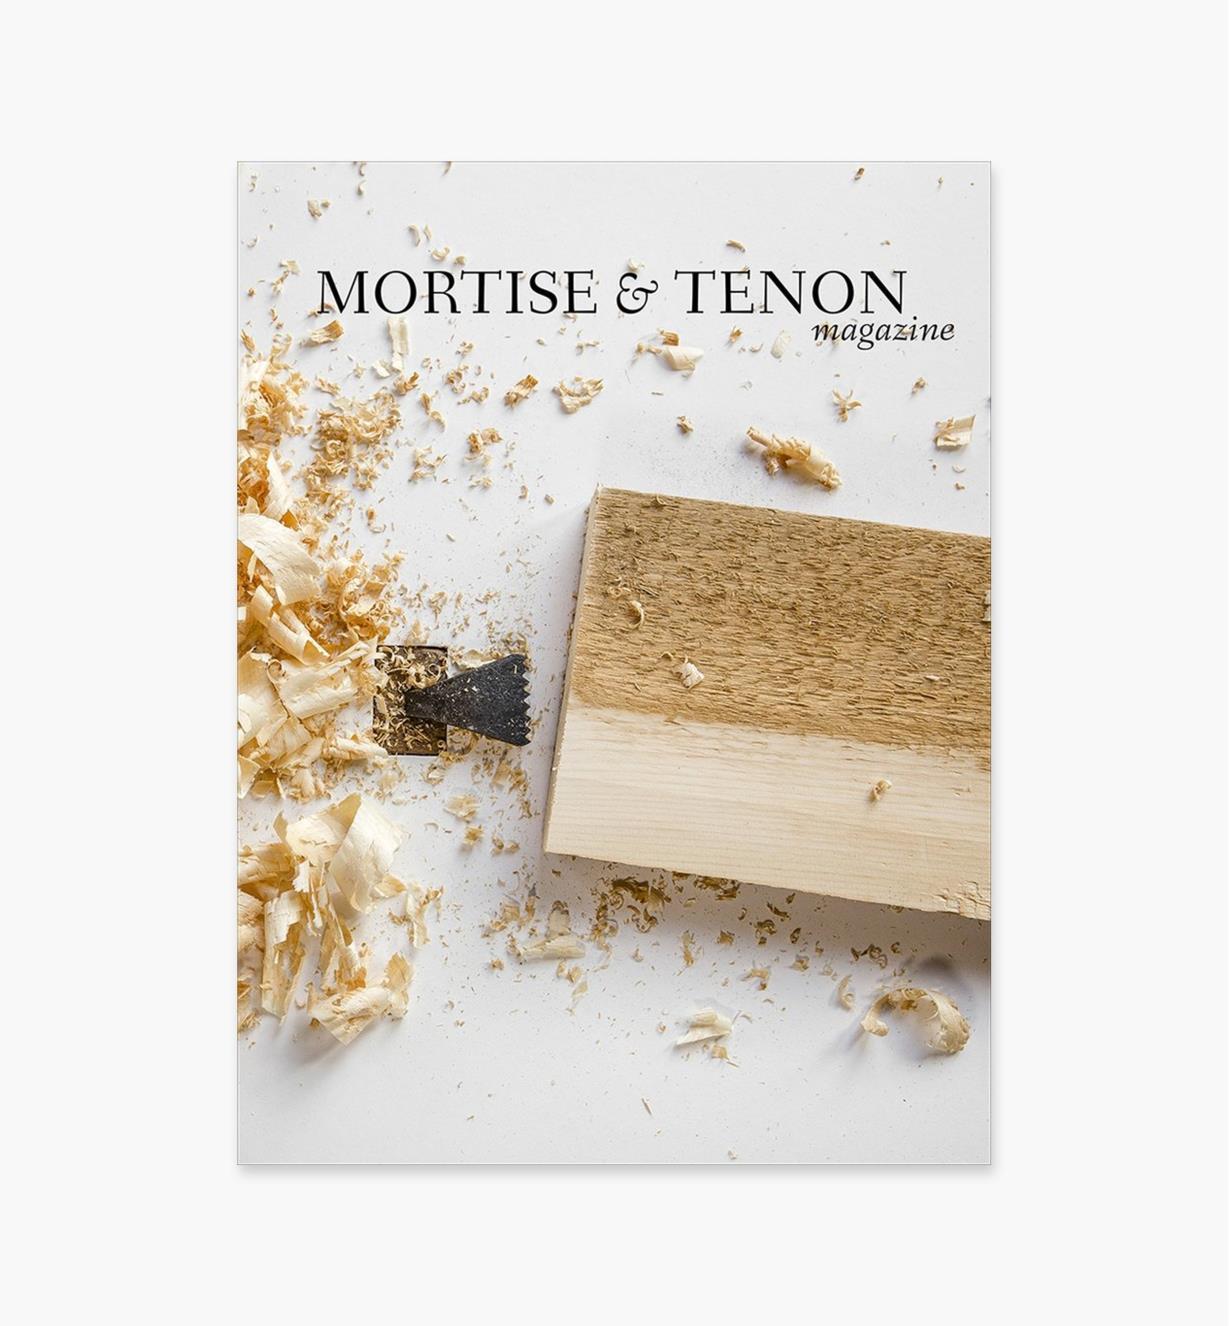 42L9517 - Mortise & Tenon Magazine, Issue 7